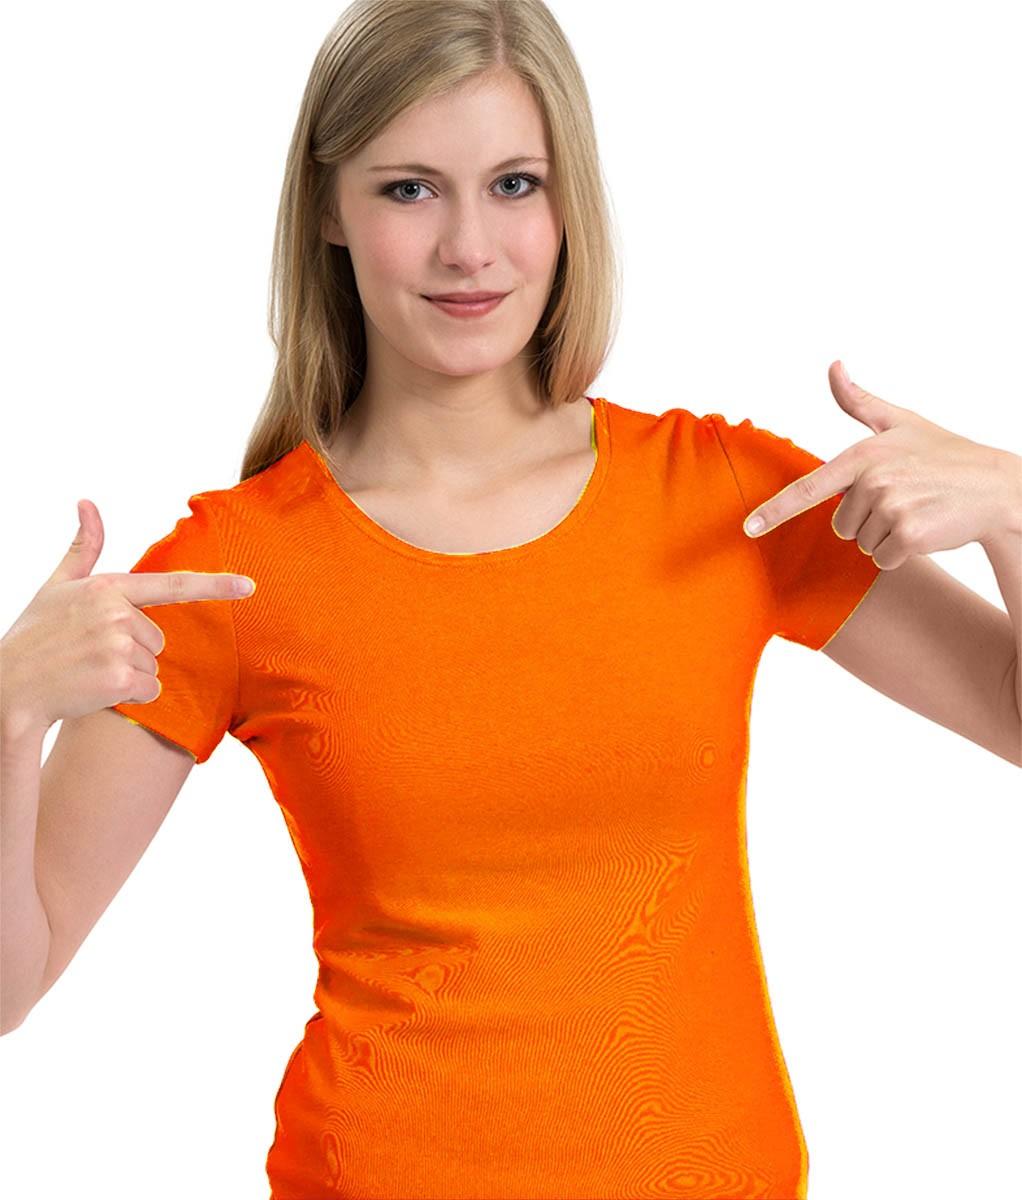 Camiseta Feminina Babylook básica laranja  100% algodão   - Dragon Store